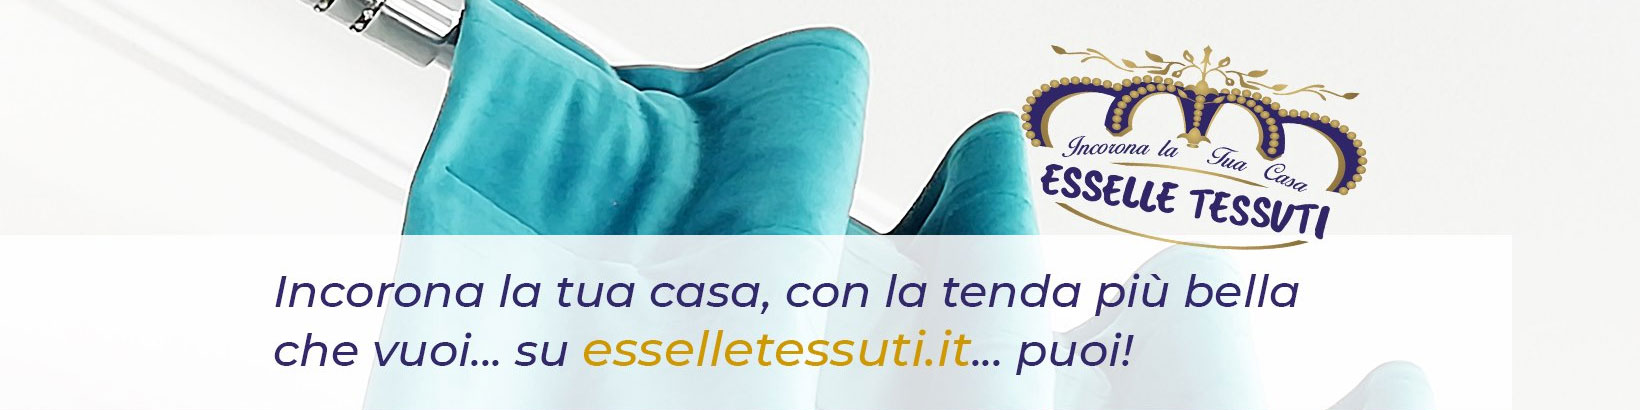 Vendita Tessuti Per Tende.Tende E Tessuti Al Metro In Vendita Online Offertissime